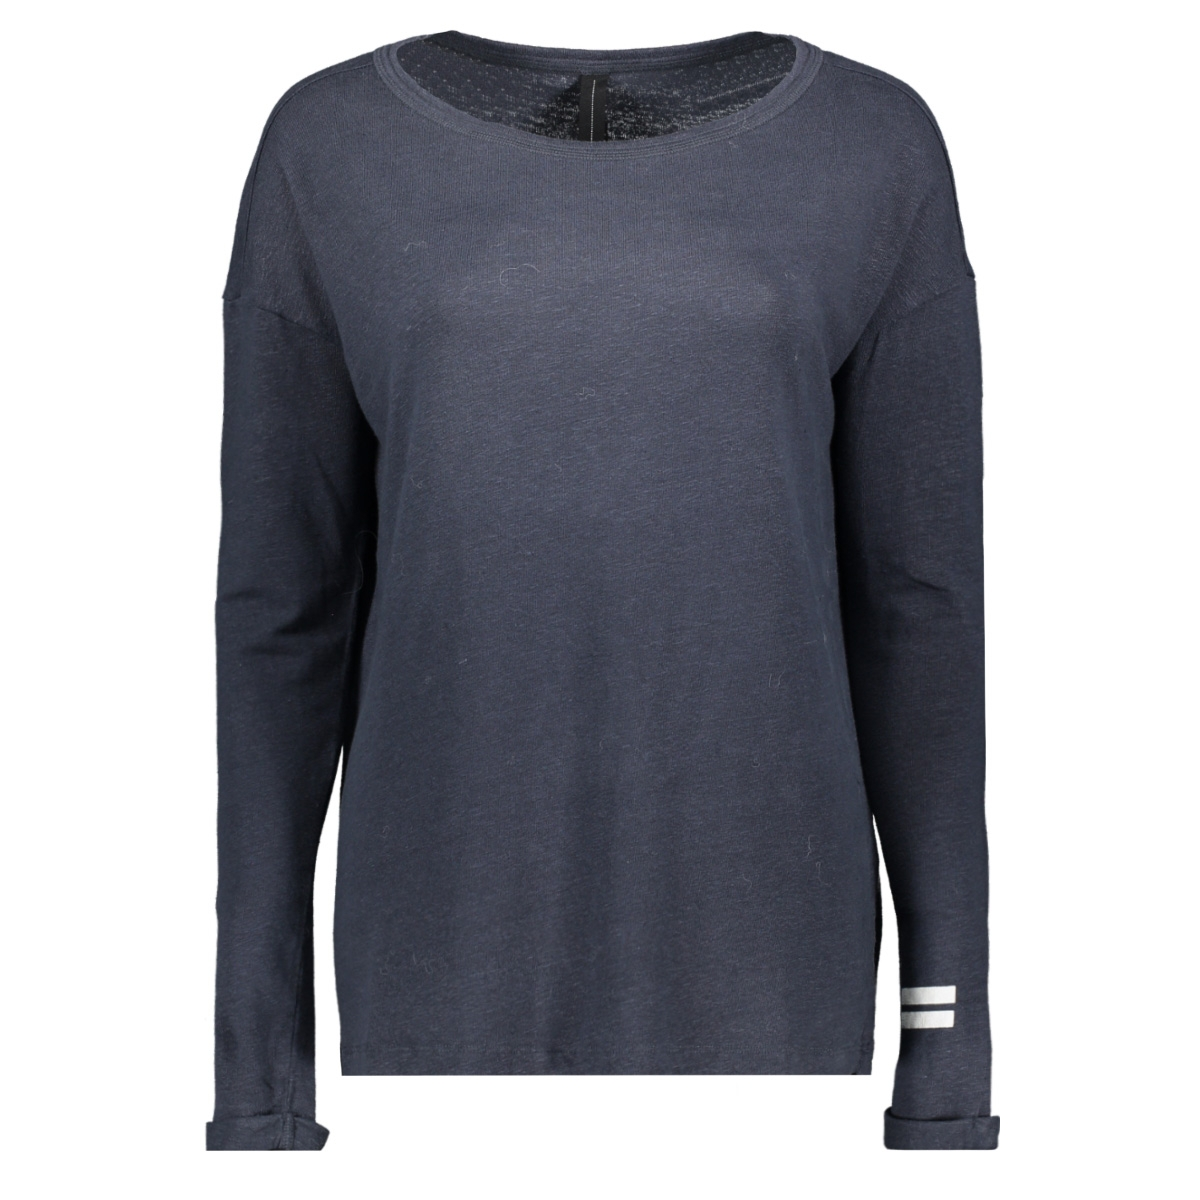 longsleeve tee 20 780 0201 10 days t-shirt dark grey blue